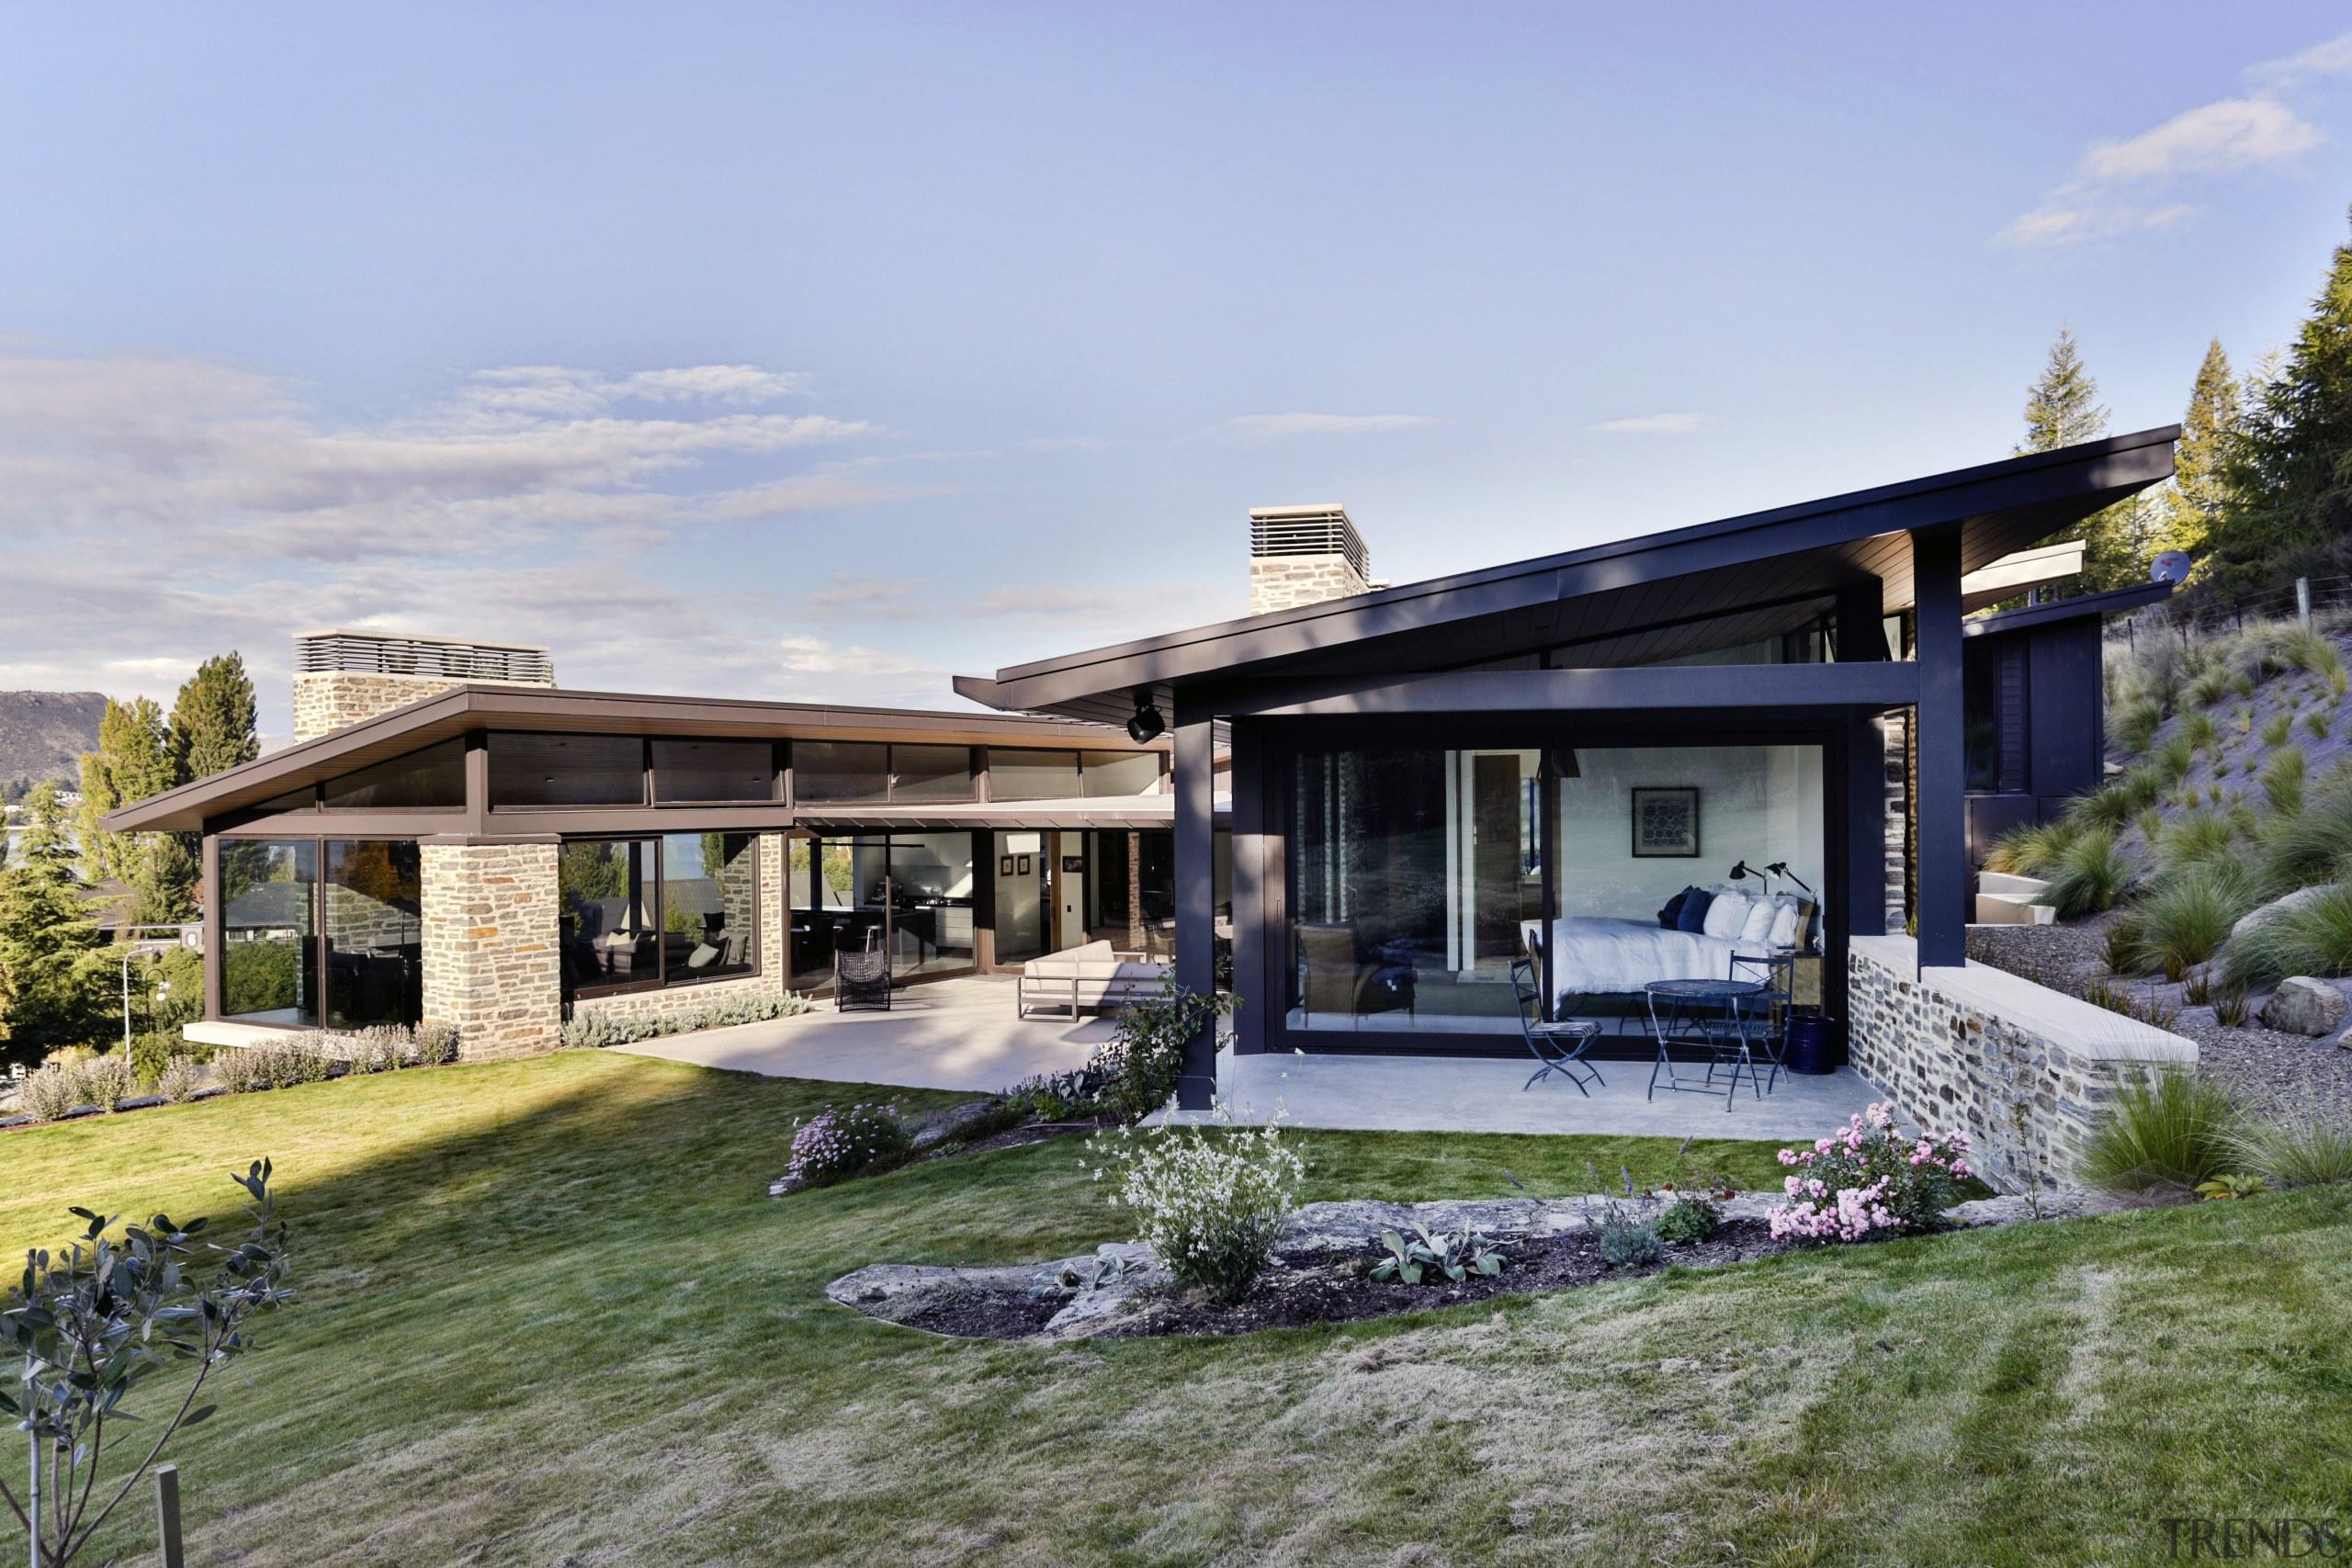 This homes master pavilion sits slightly higher on architecture, cottage, elevation, estate, facade, home, house, landscape, property, real estate, villa, teal